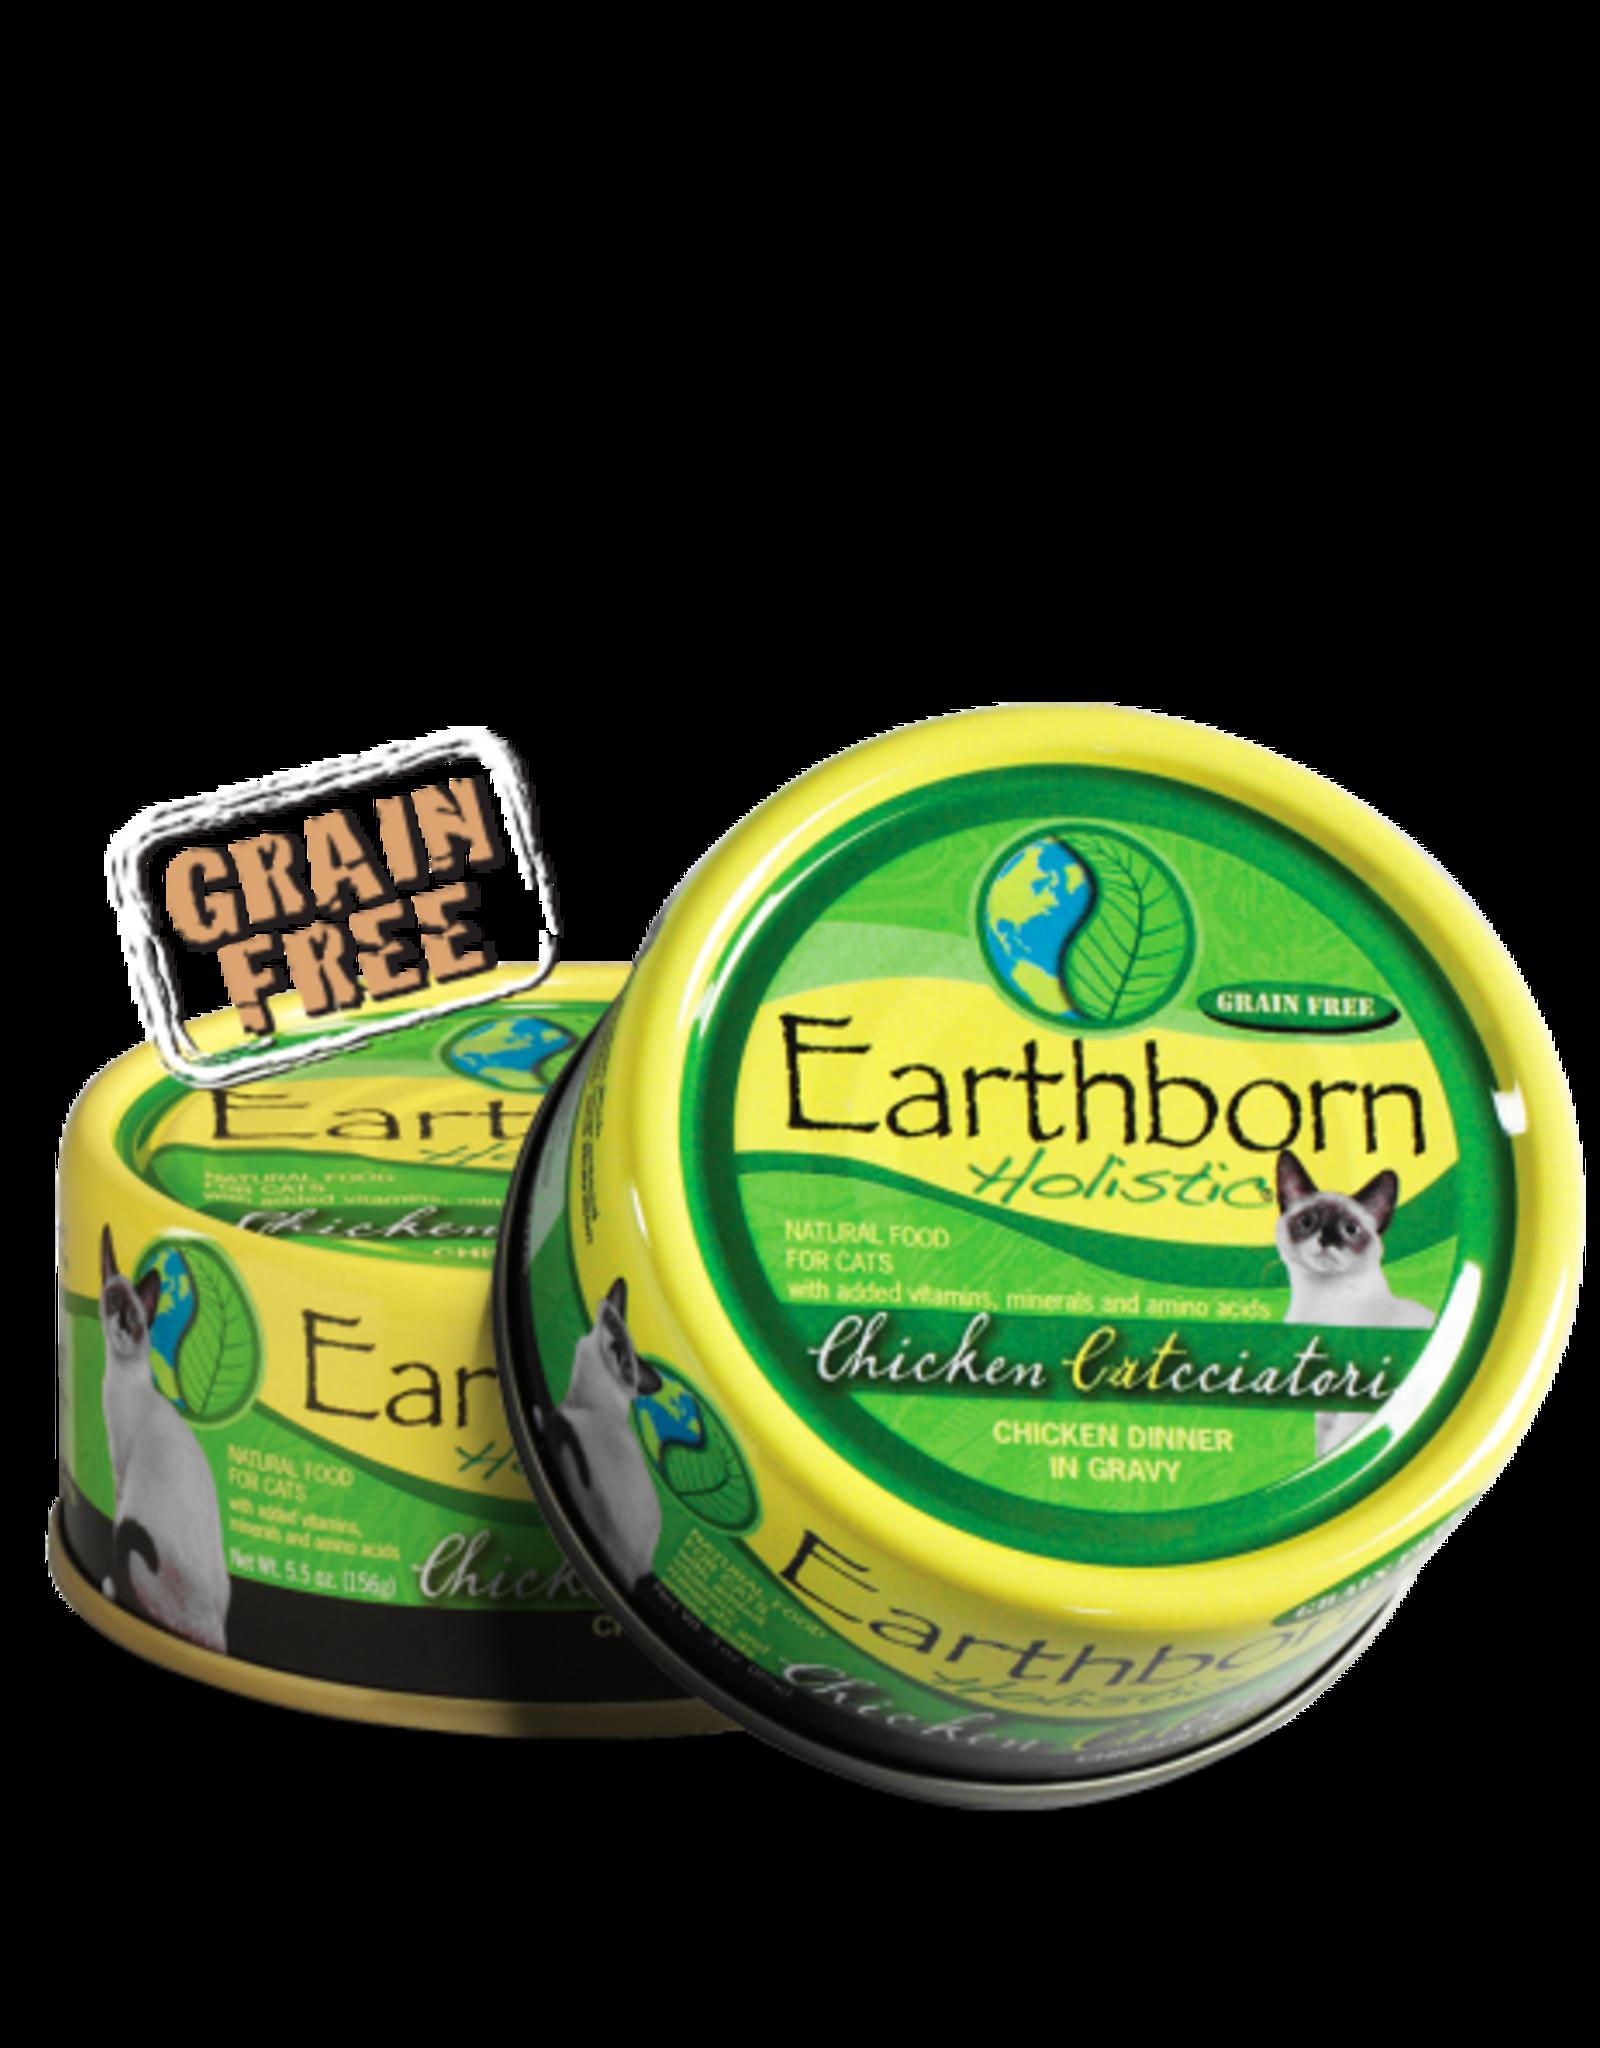 EARTHBORN EARTHBORN HOLISTIC CAT CHICKEN CATCCIATORI CAN 3OZ CASE OF 24